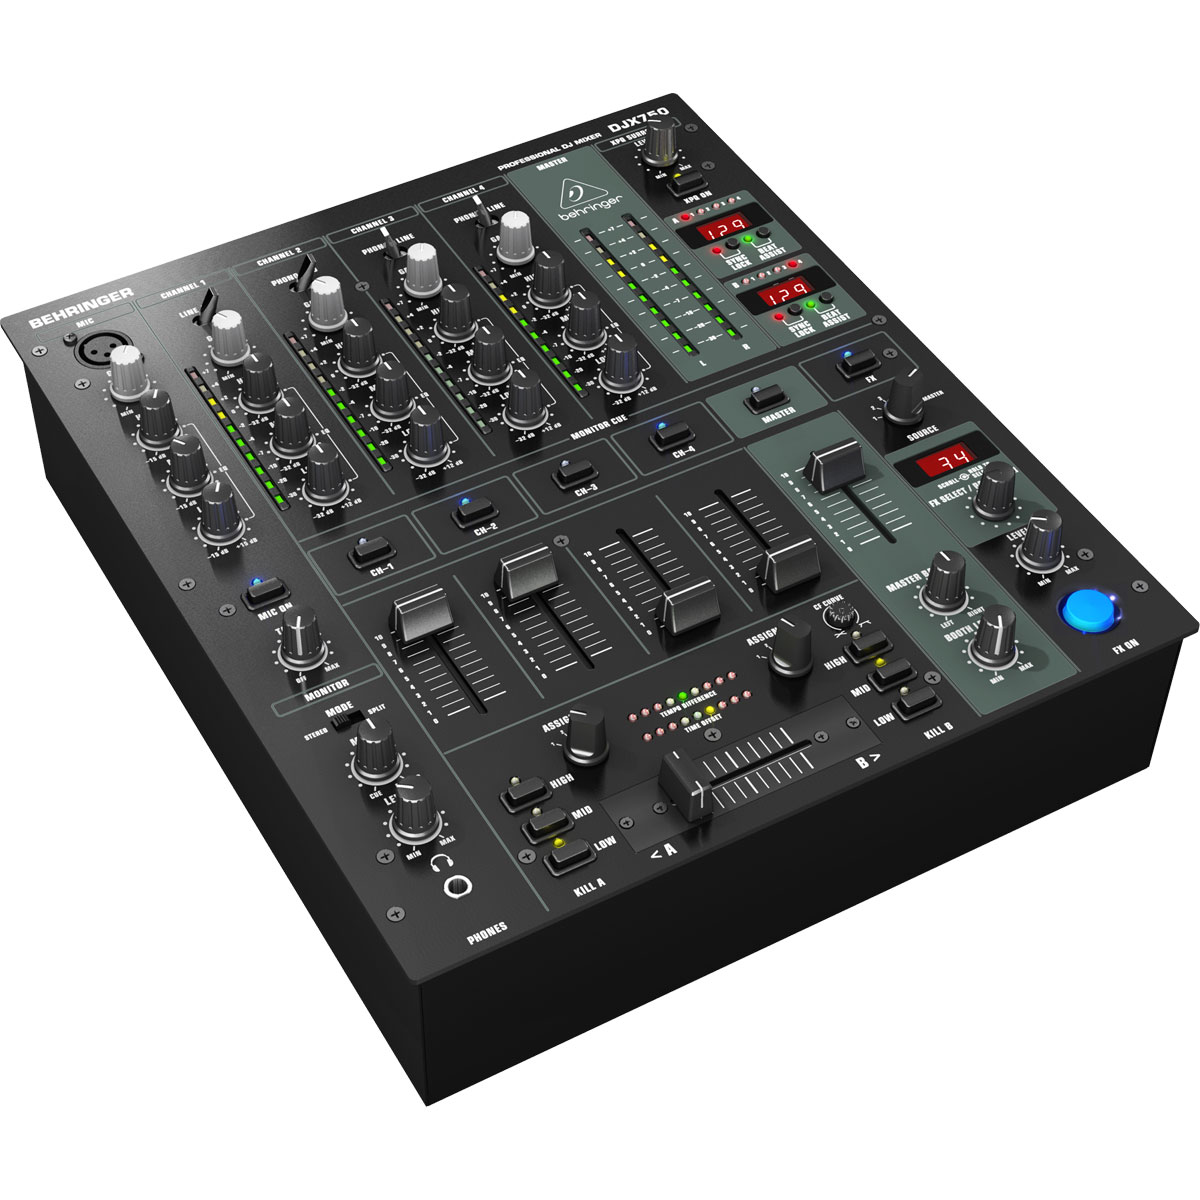 DJX750 - Mixer DJ 5 Canais Pro Mixer DJX 750 - Behringer